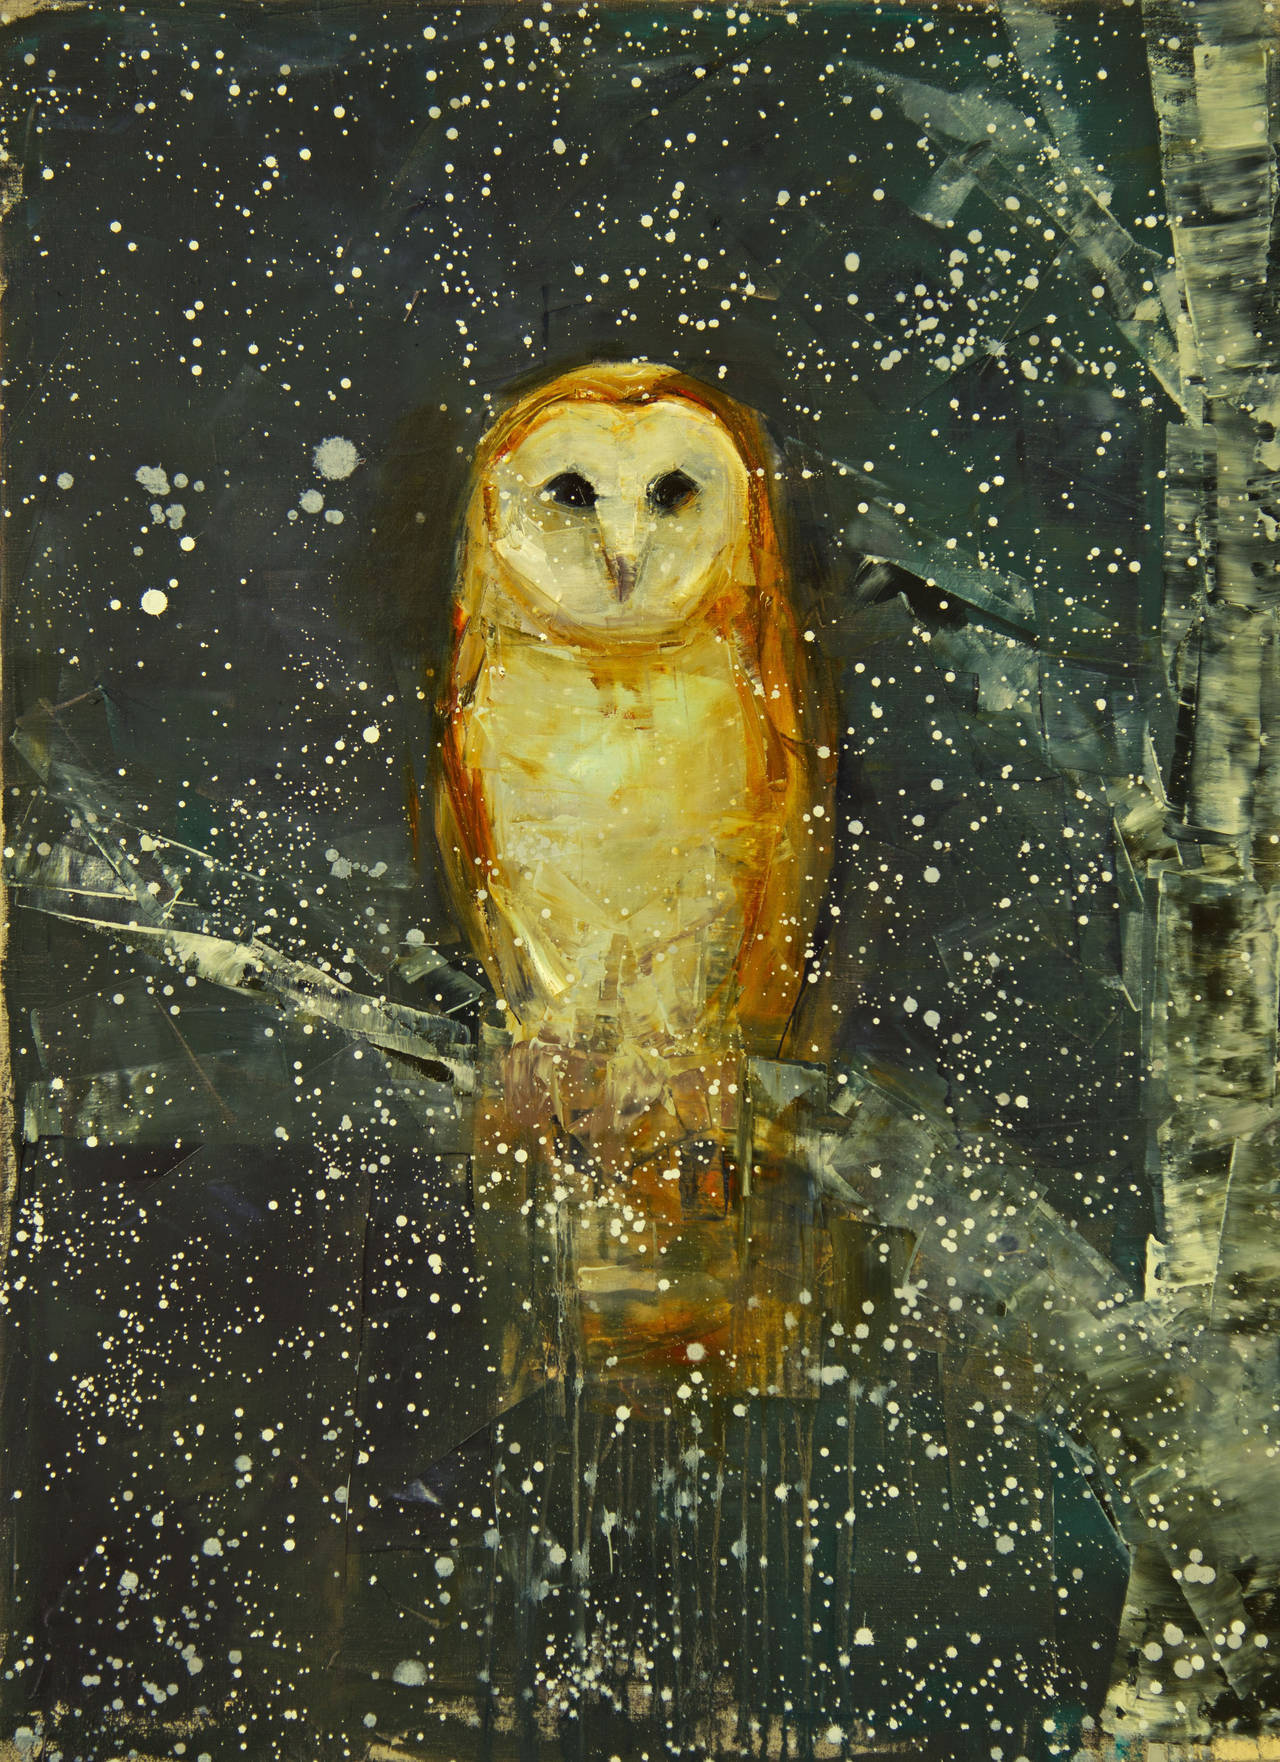 Rebecca Kinkead Barn Owl Snowy Sky Painting For Sale